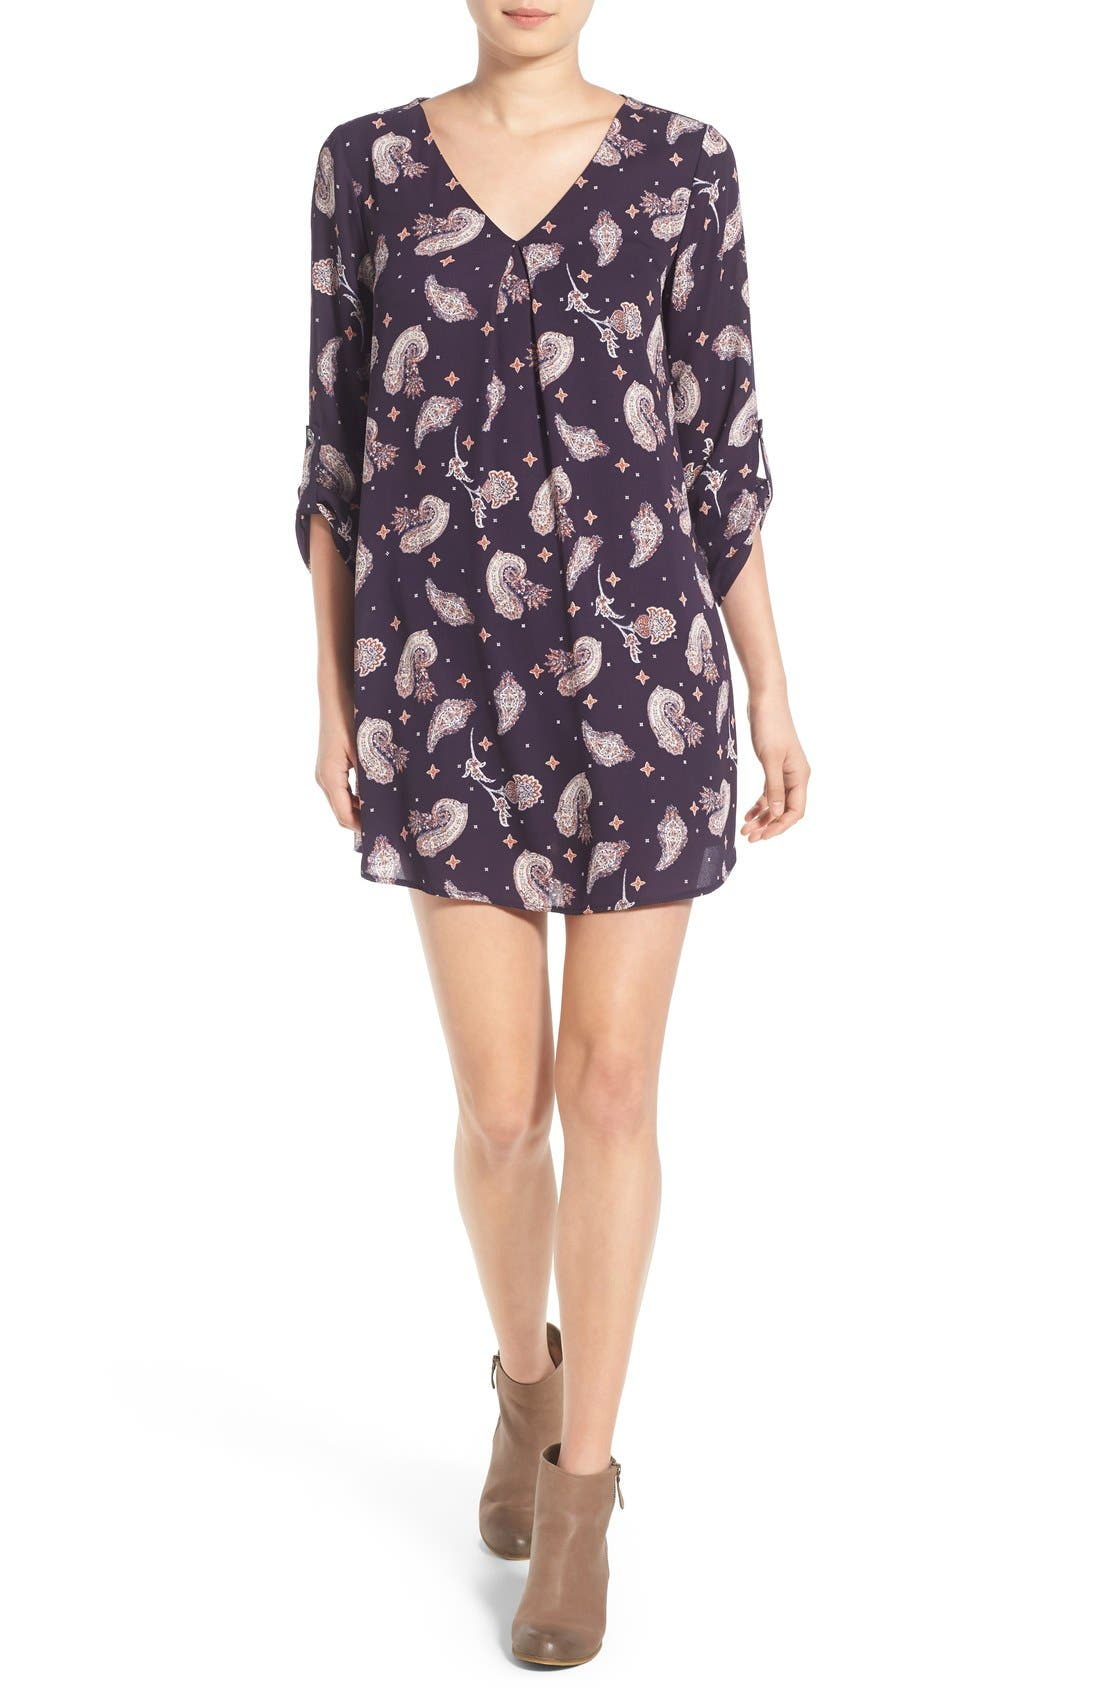 Alternate Image 1 Selected - Lush 'Karly' Shift Dress